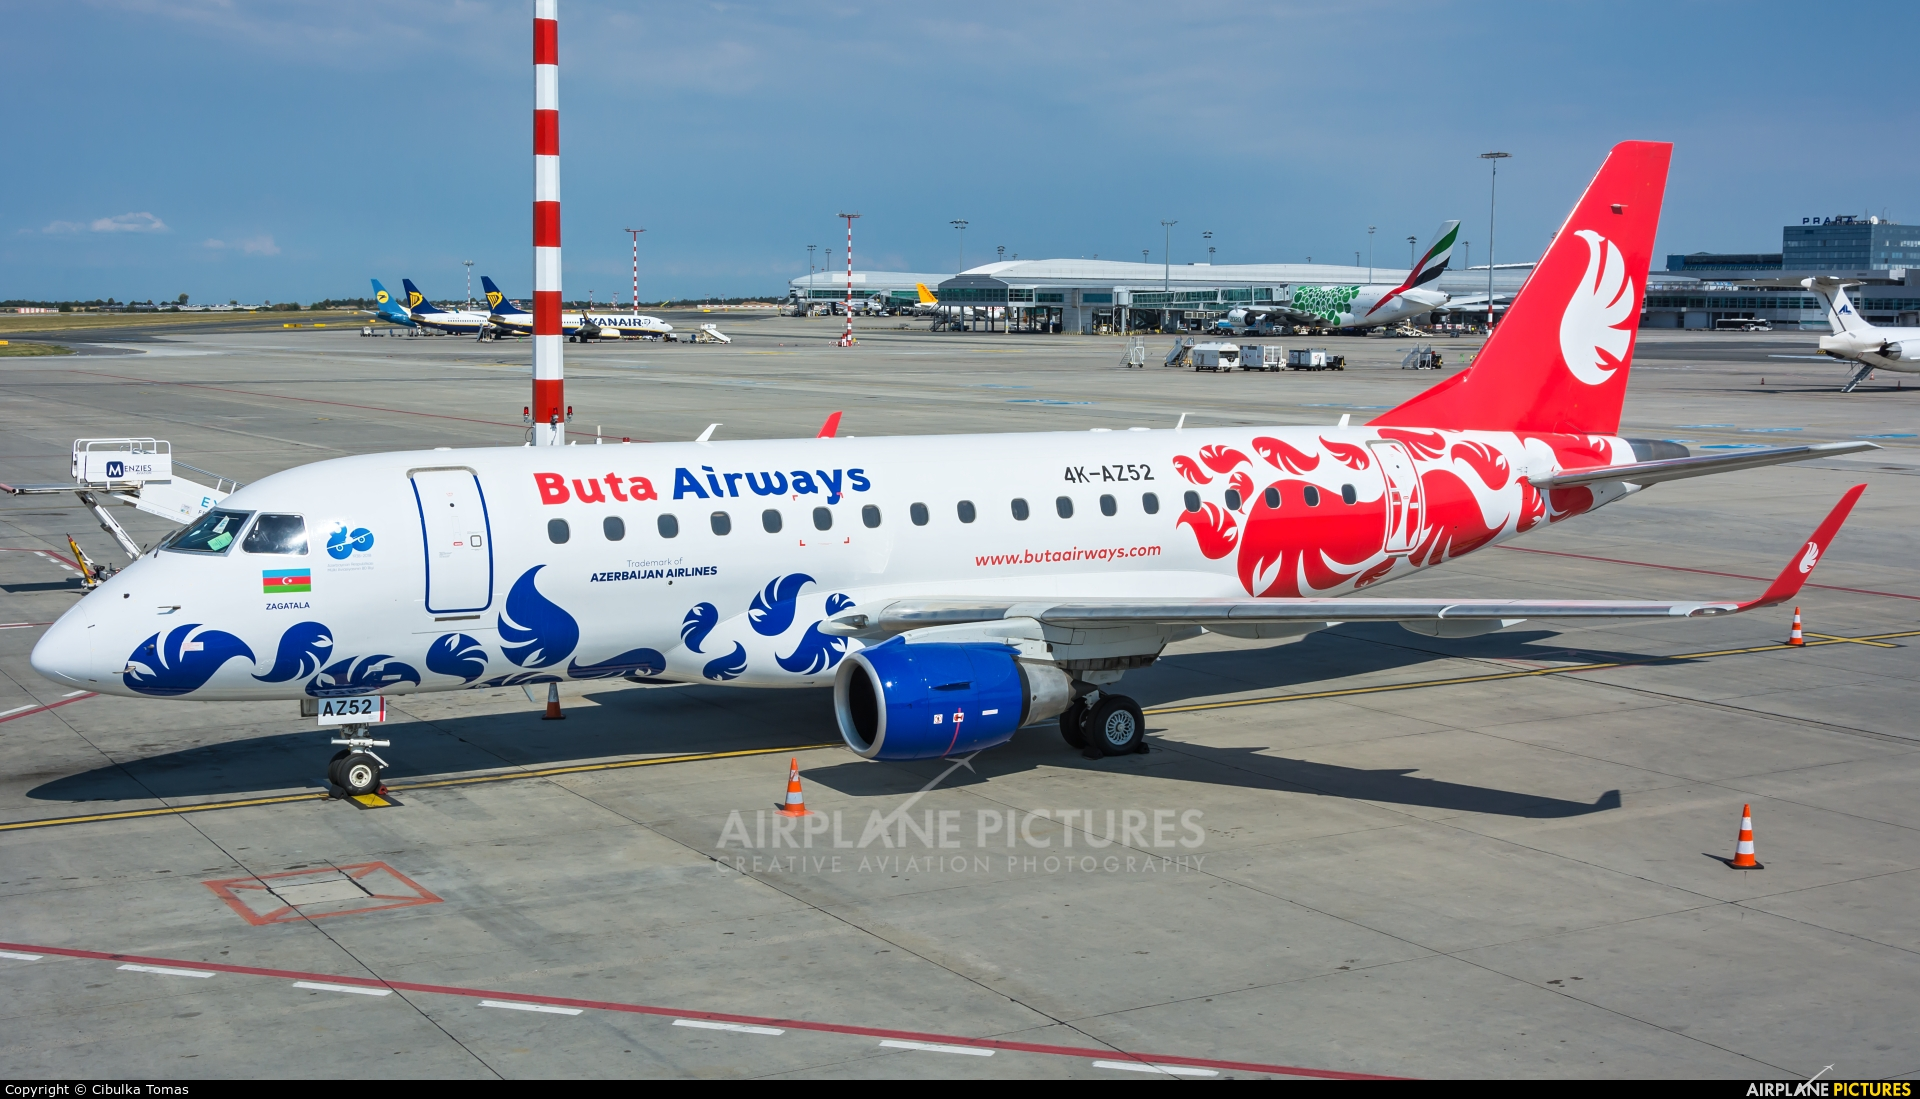 Buta Airways 4K-AZ52 aircraft at Prague - Václav Havel